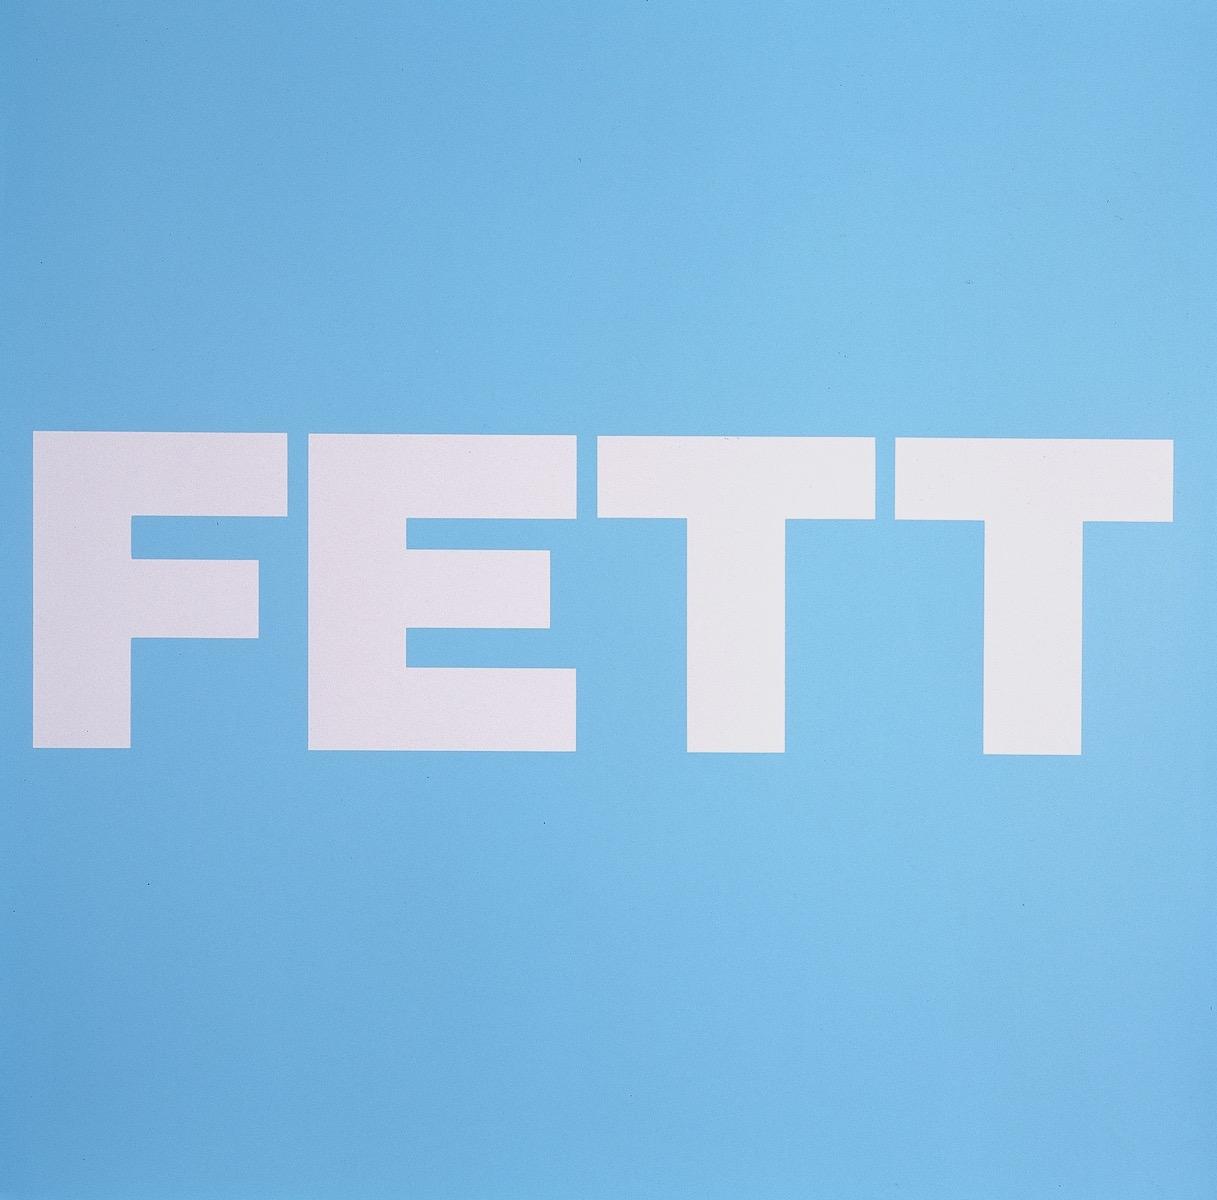 FETT, BLAU | Affirmation tut gut | Angelika Beuler | 1992